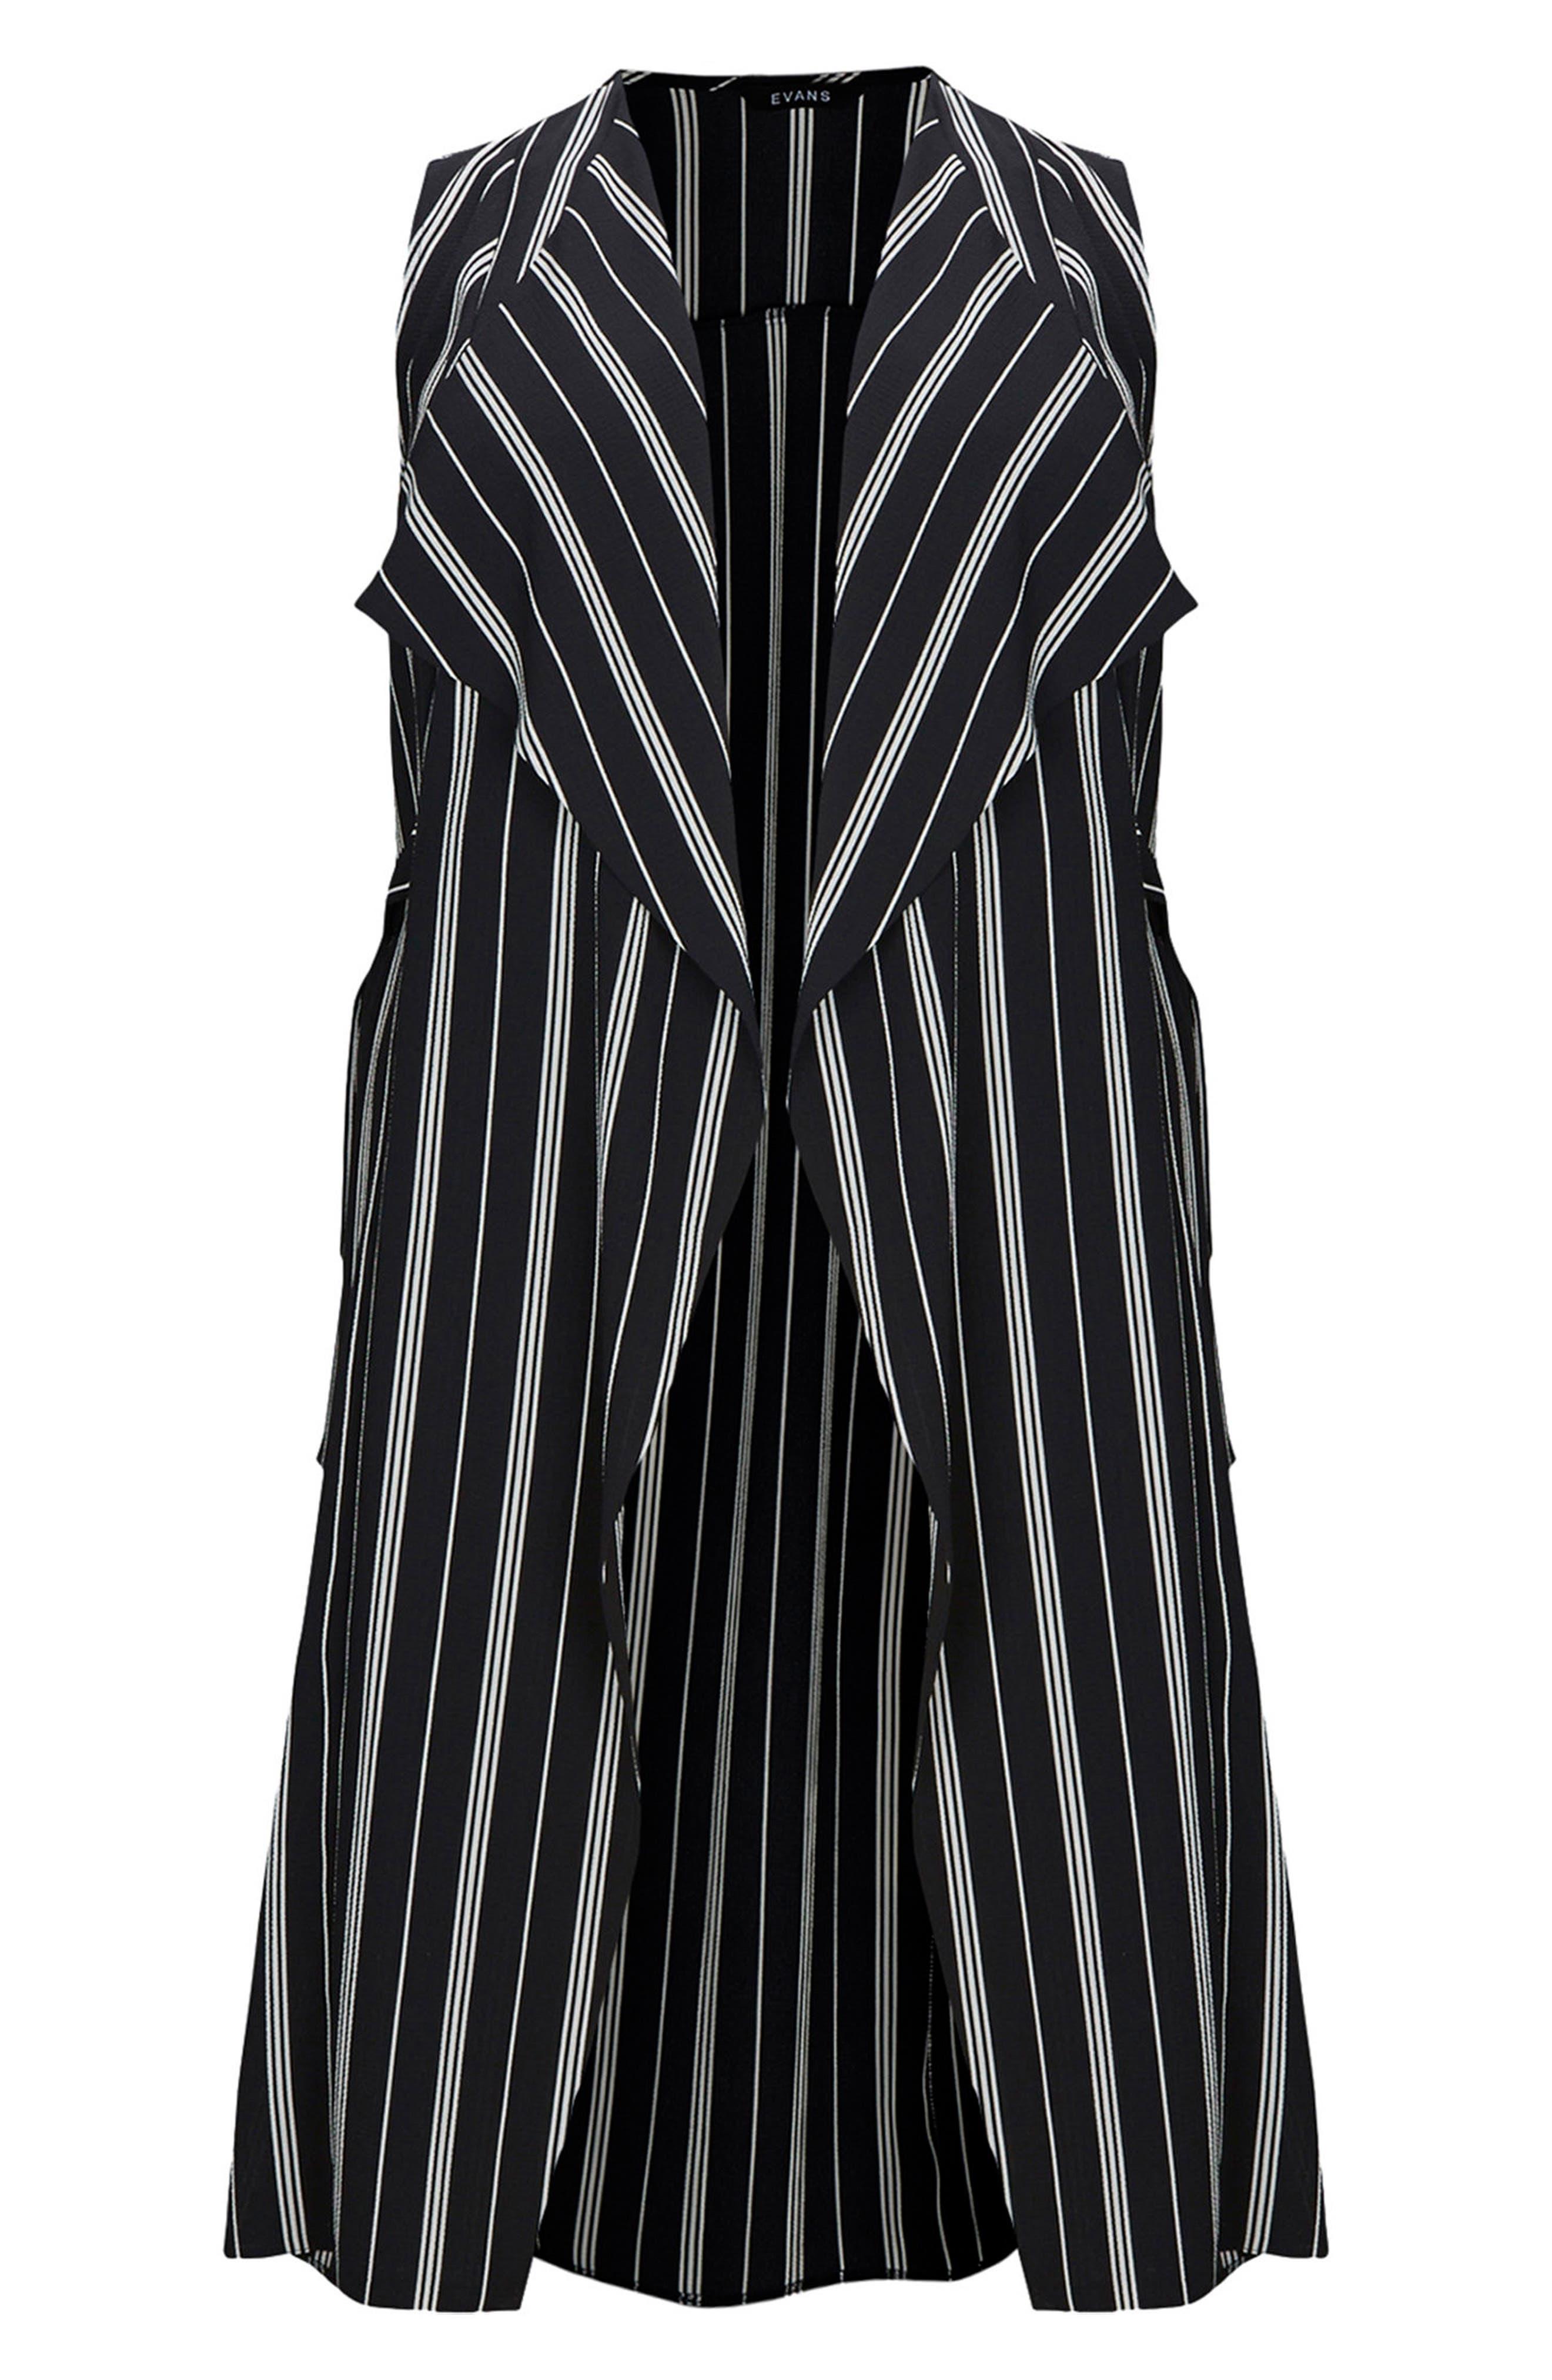 Stripe Sleeveless Jacket,                             Alternate thumbnail 4, color,                             Black/ White